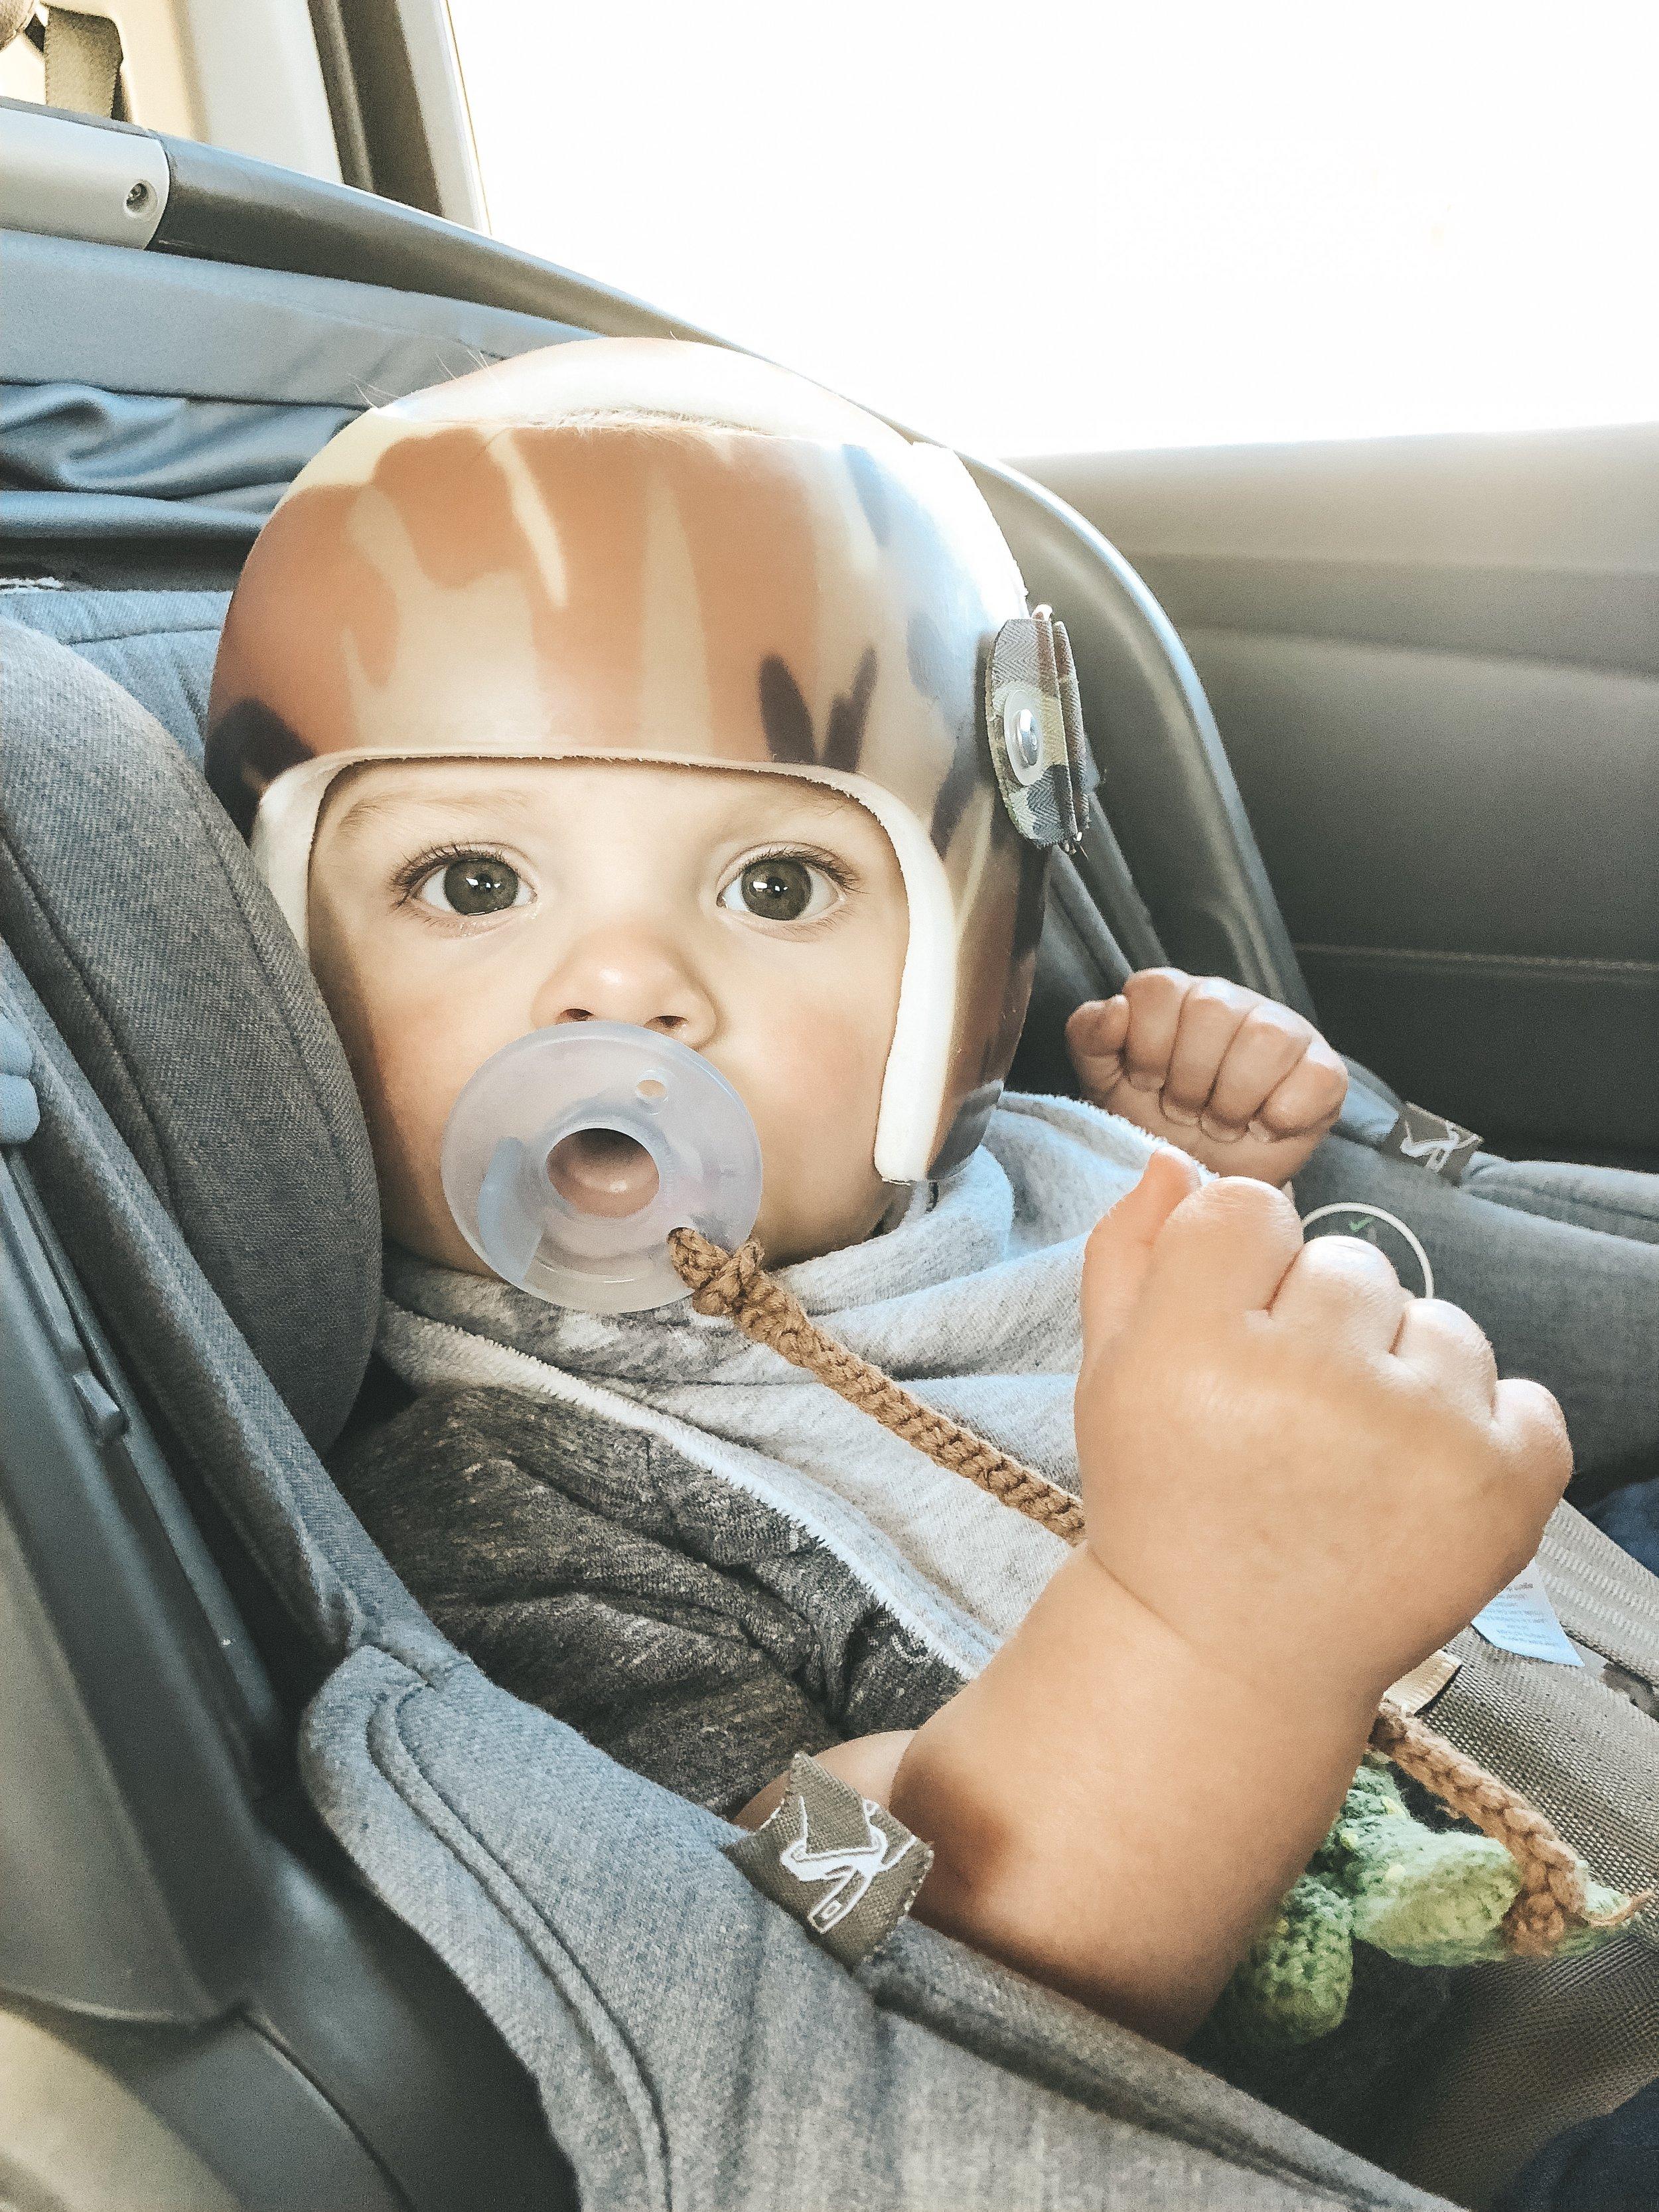 Jett Jones. 8 Months Old. Uppababy Mesa in Henry blue.